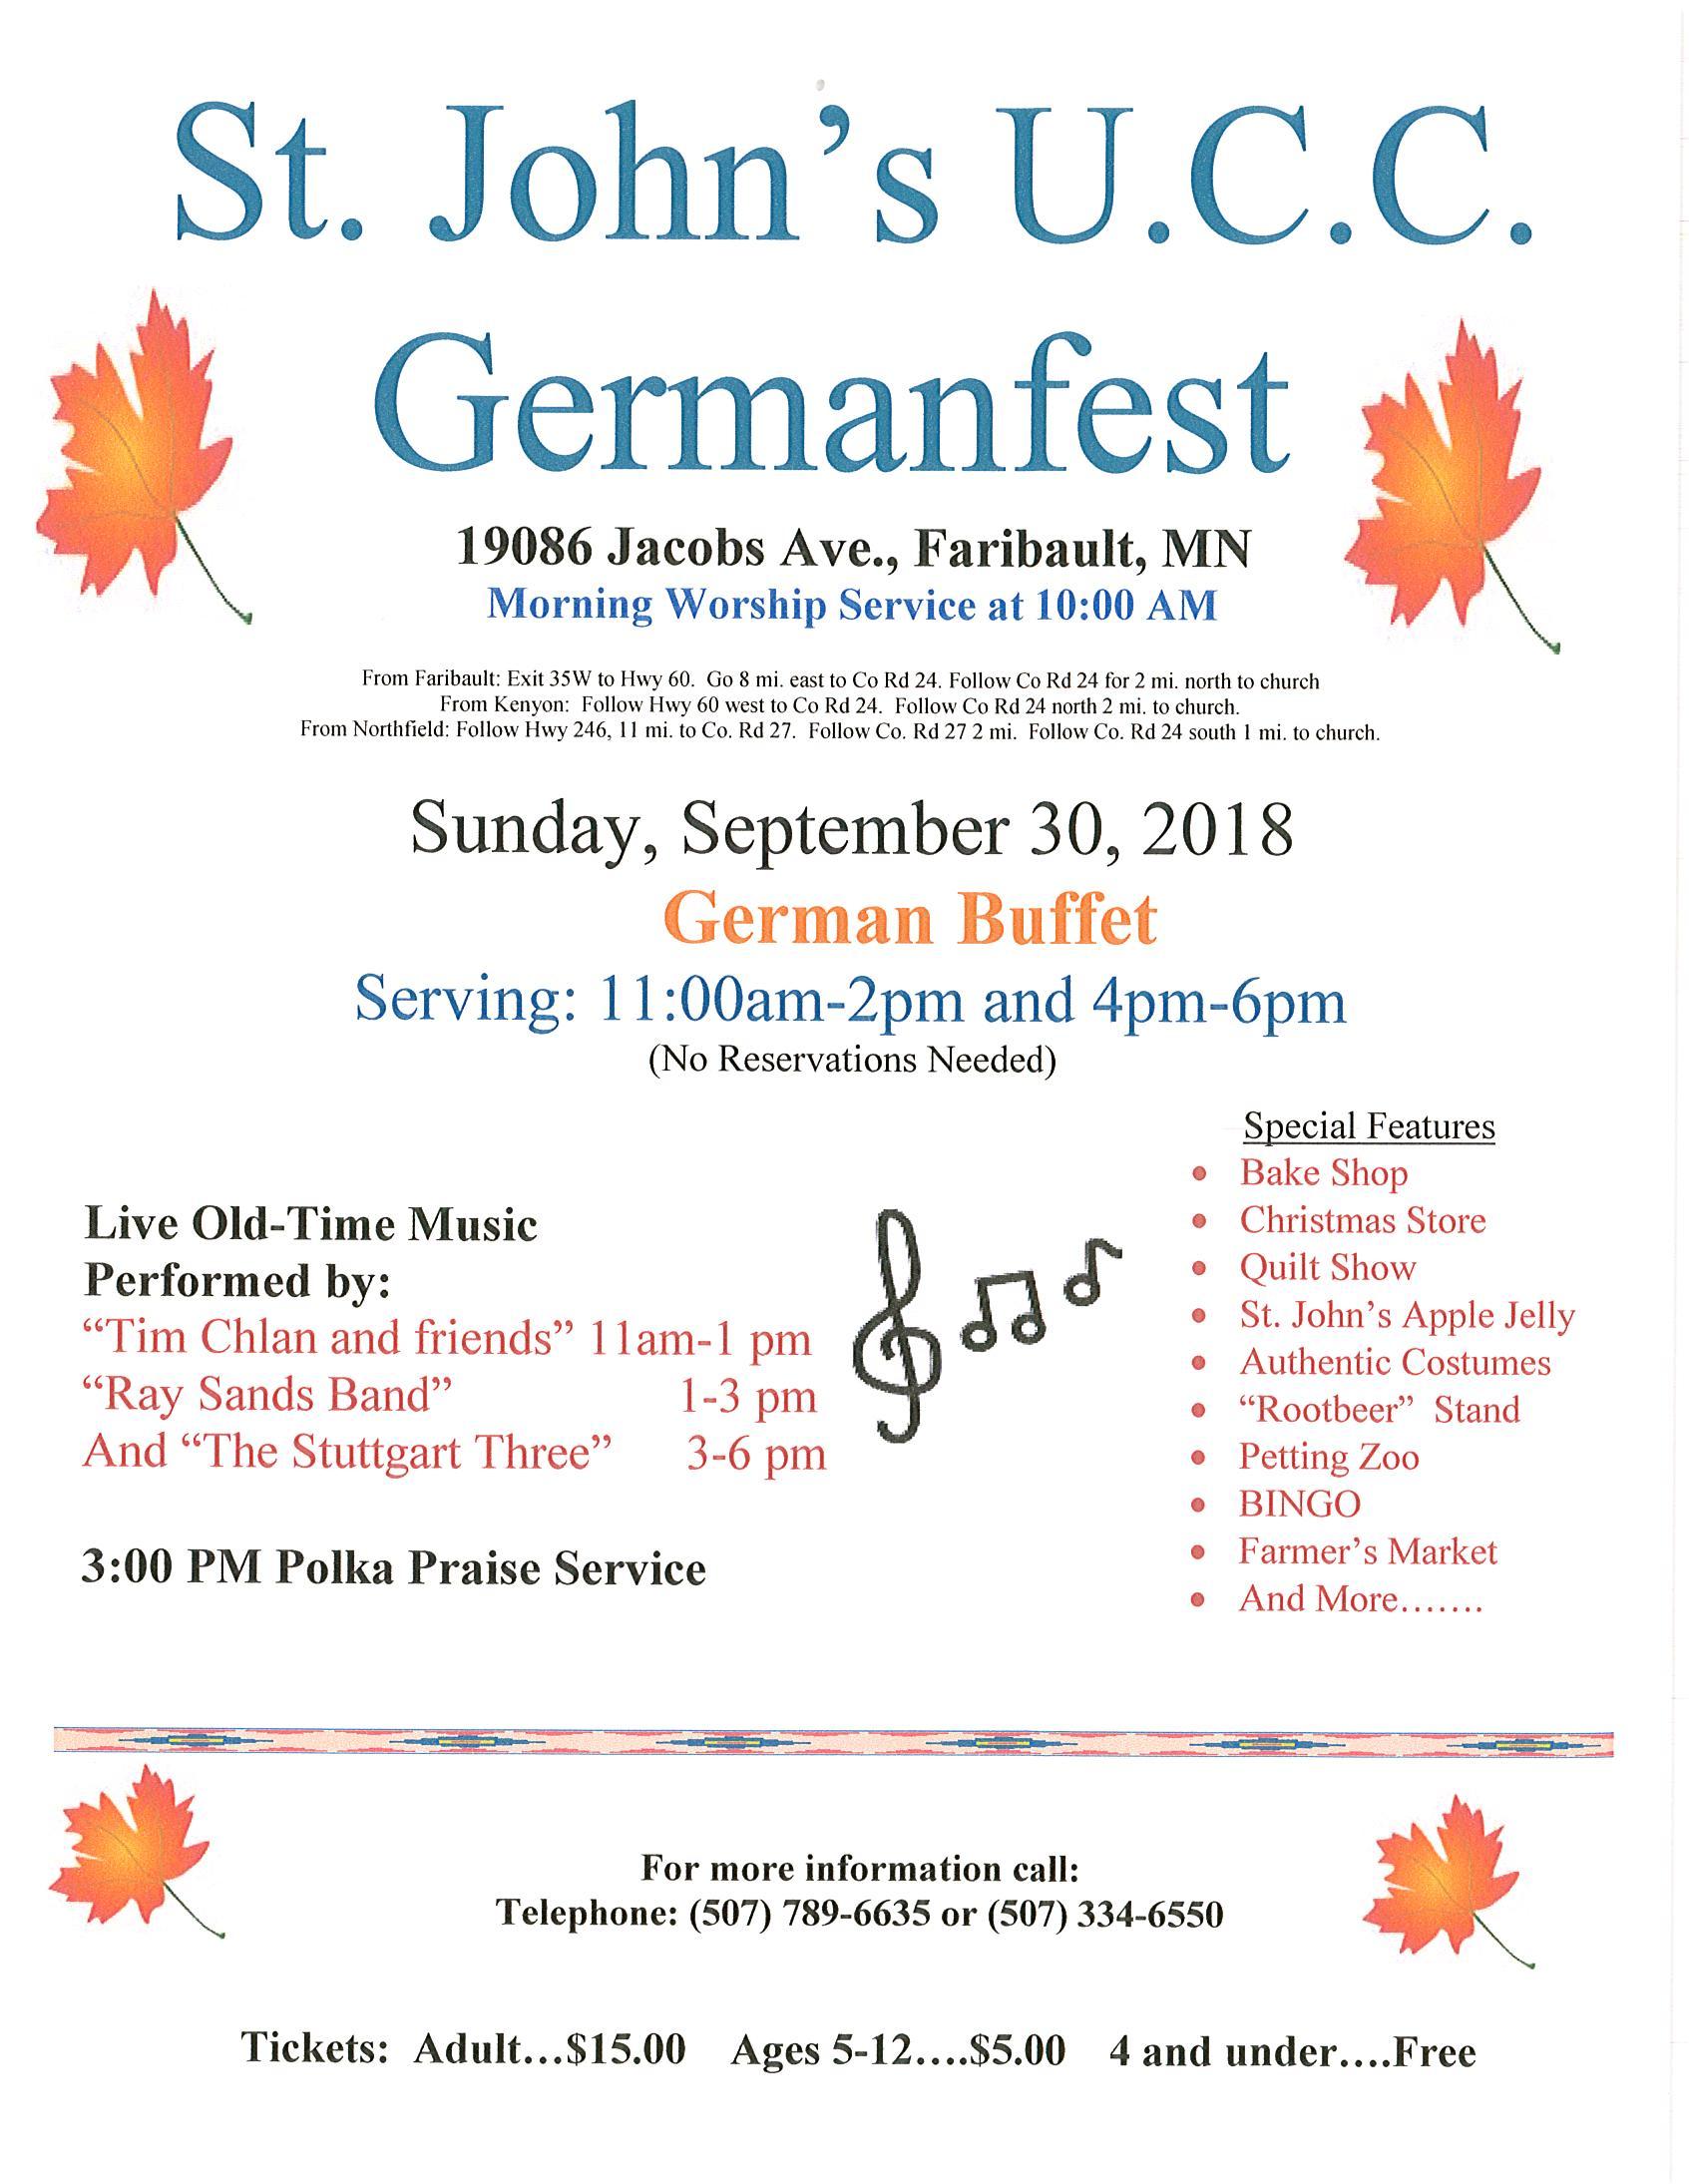 Germanfest 2018